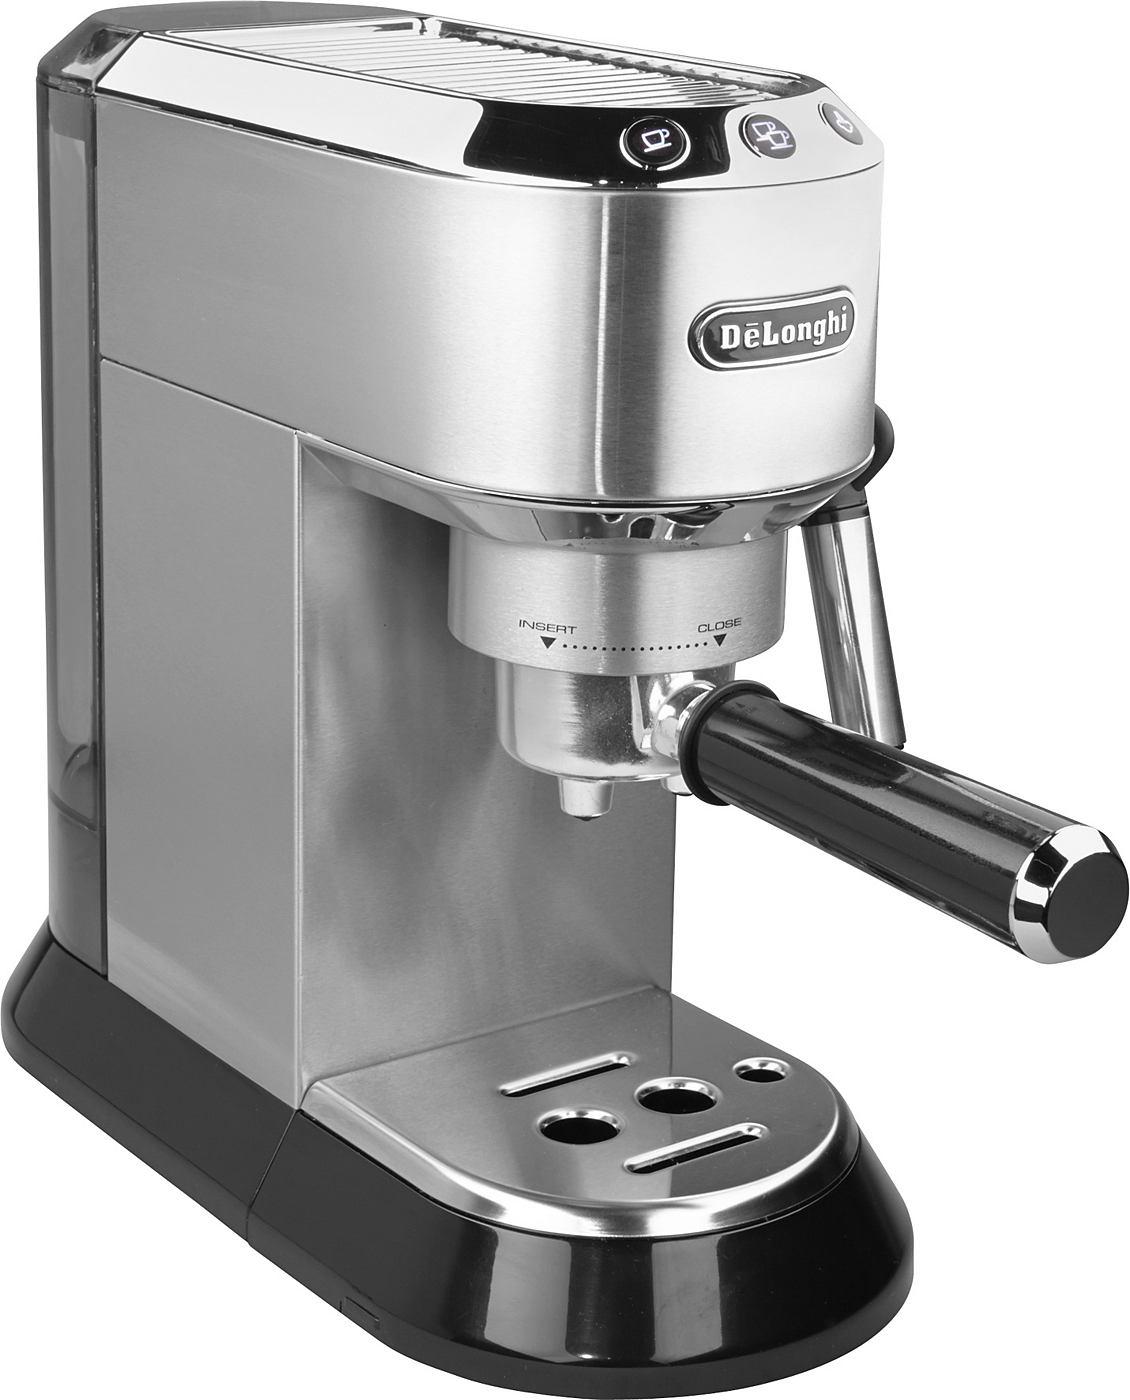 De´Longhi Espressomaschine - traditioneller Siebträger EC 680.M